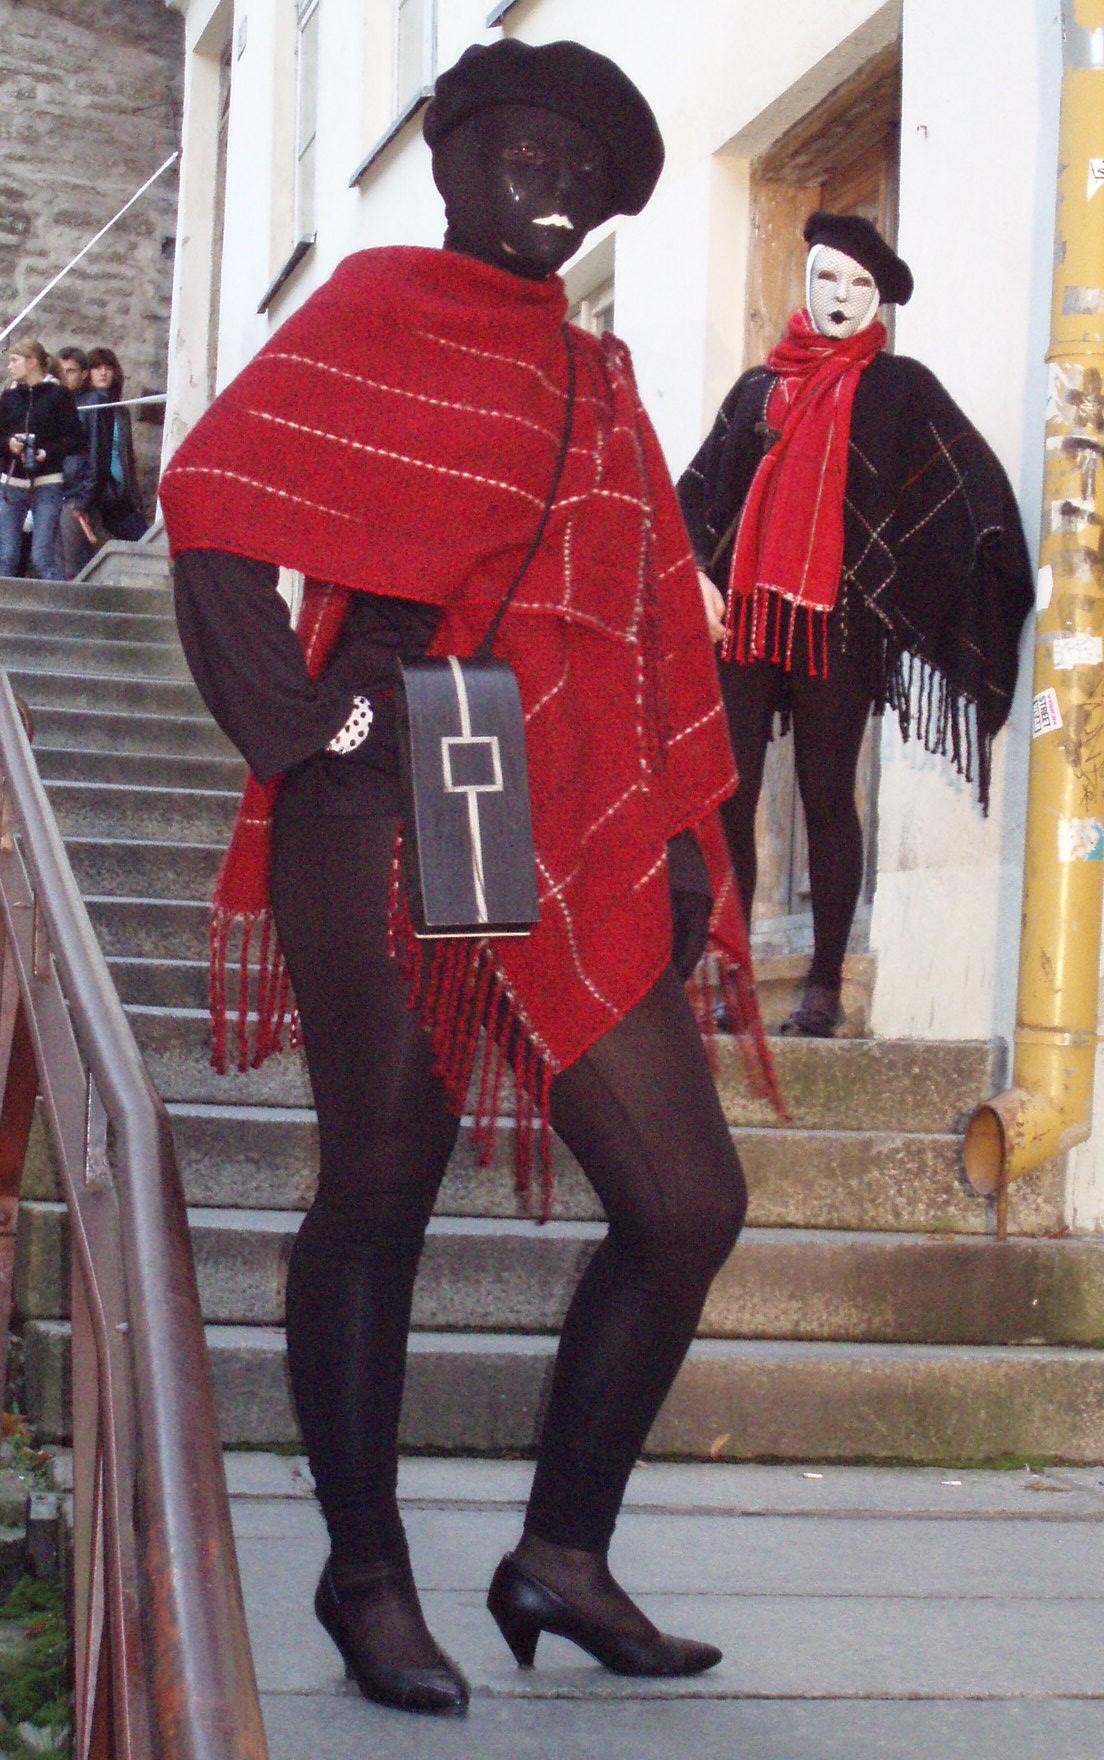 modell kandmas musta puidust intarsiakotti ruudu kontuuri ja vertikaalse triibuga